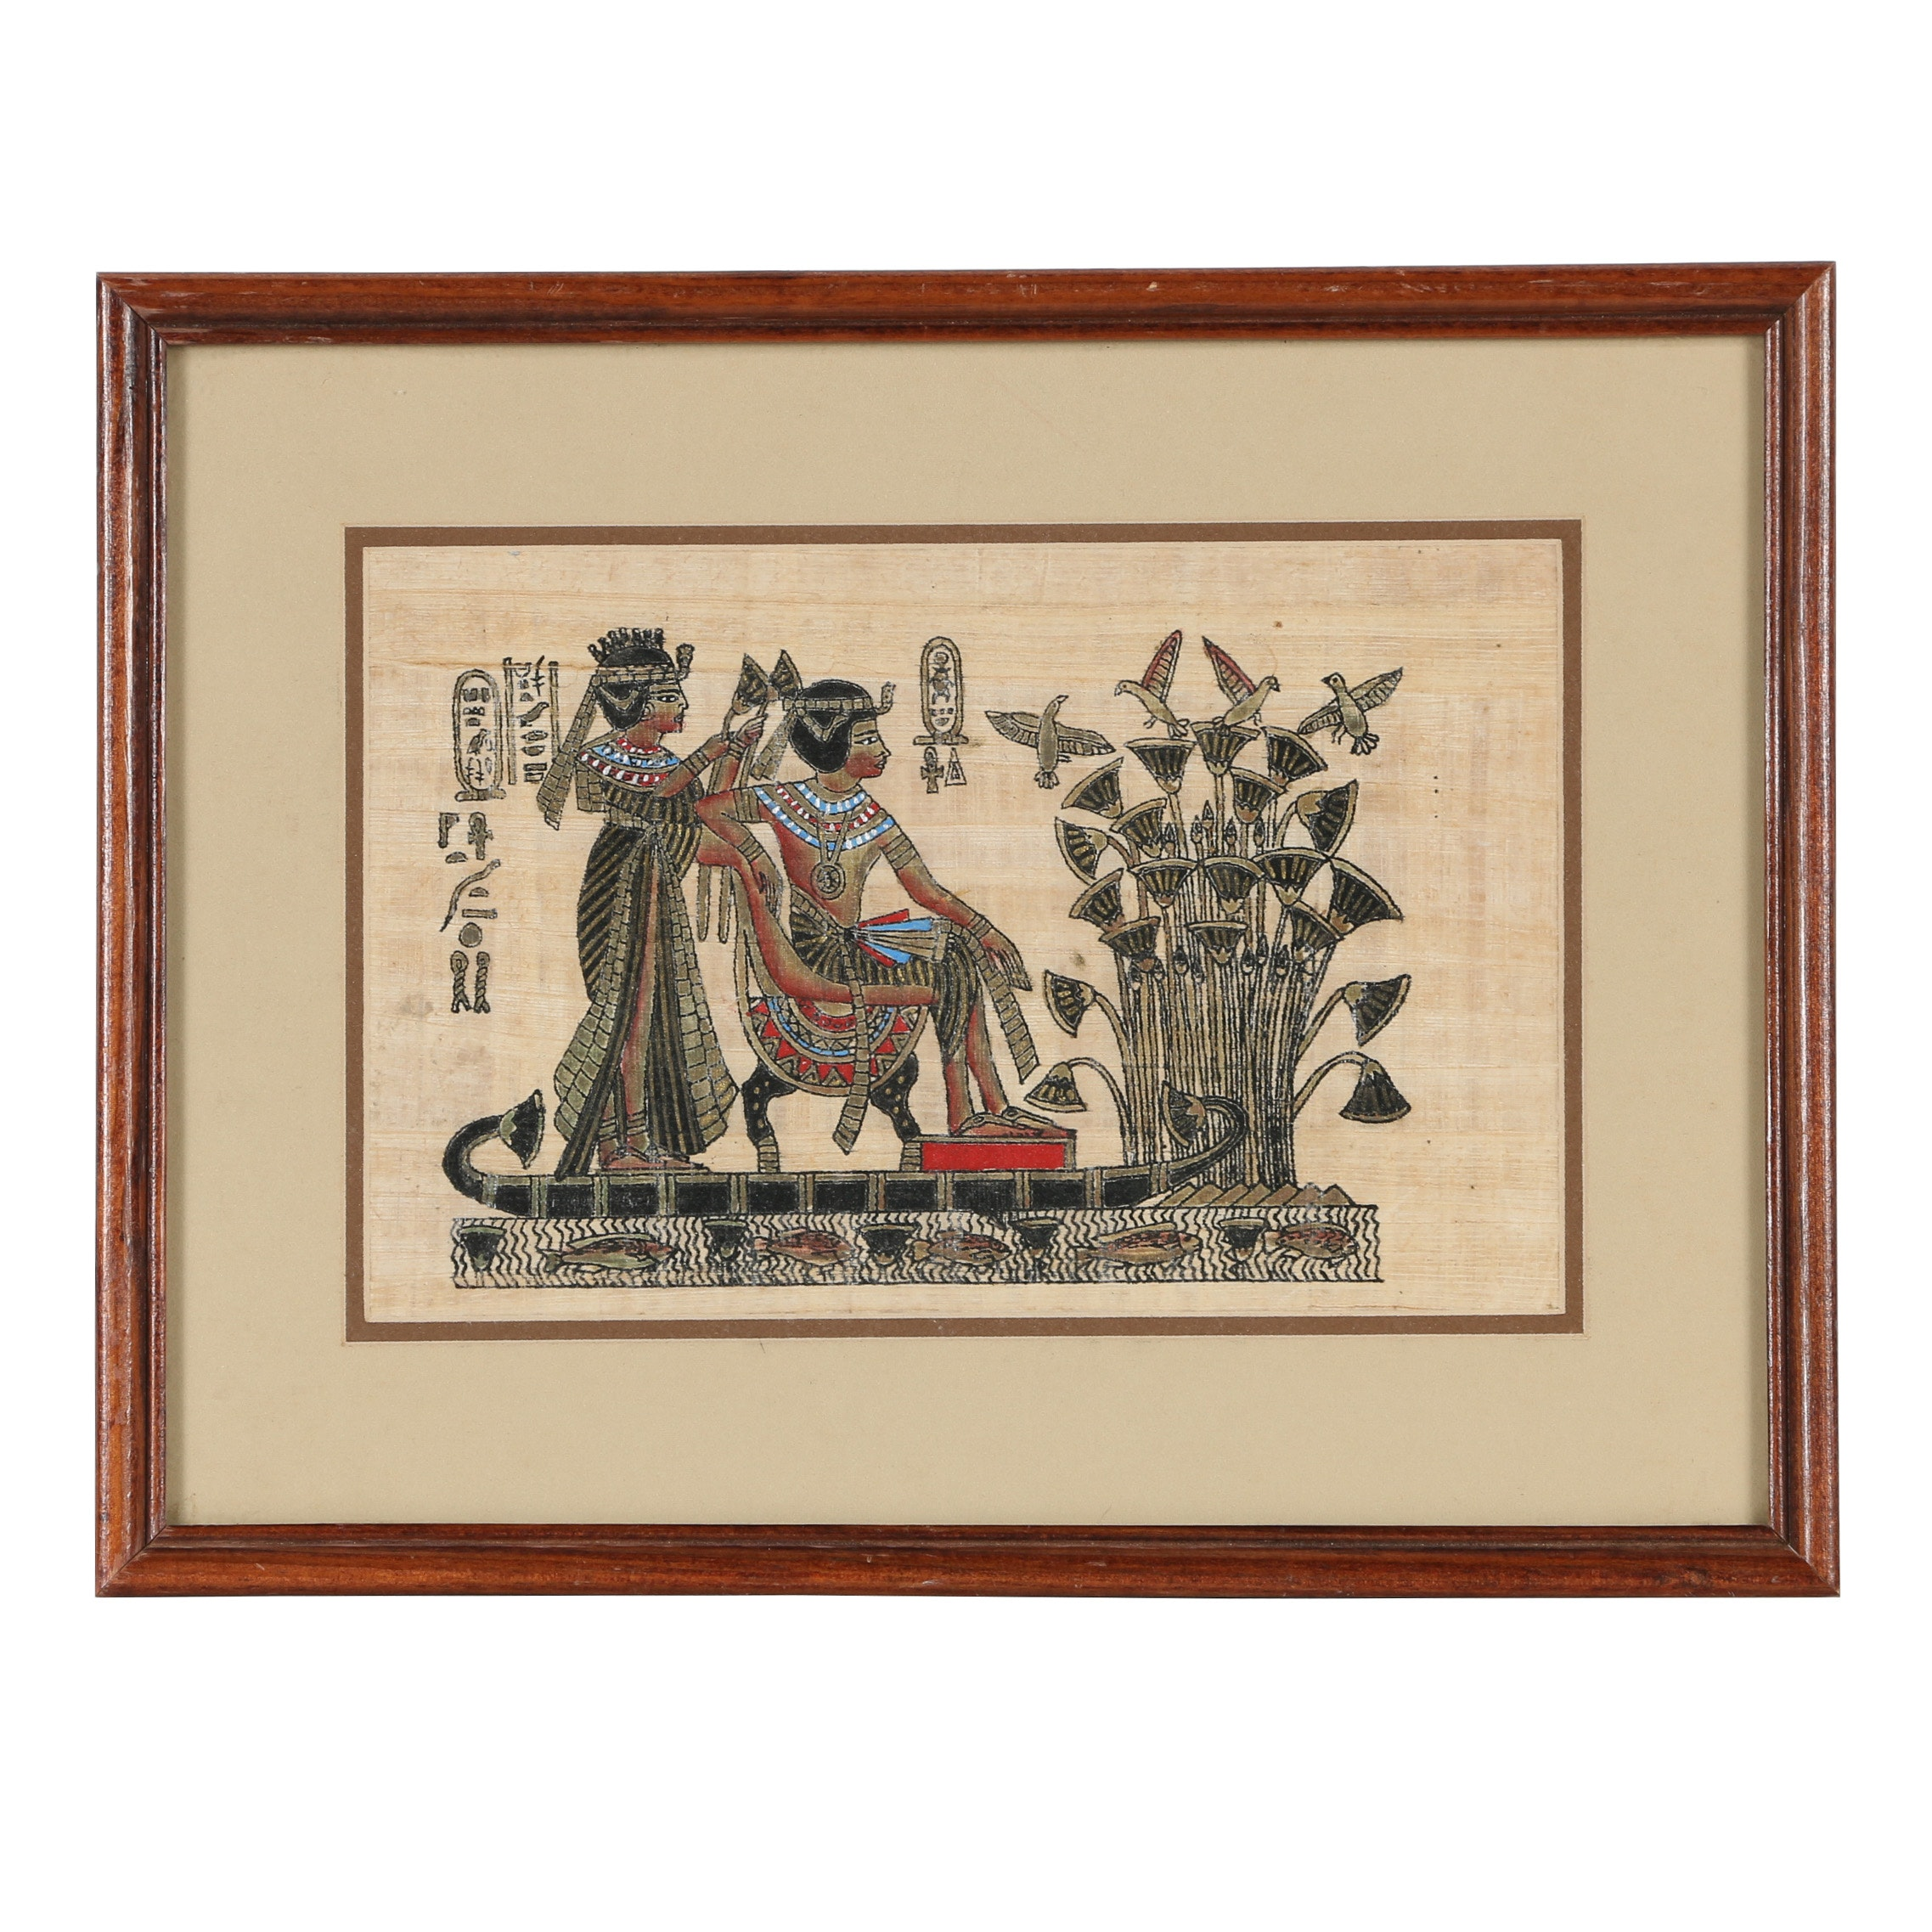 Egyptian-Style Novelty Acrylic Painting on Papyrus